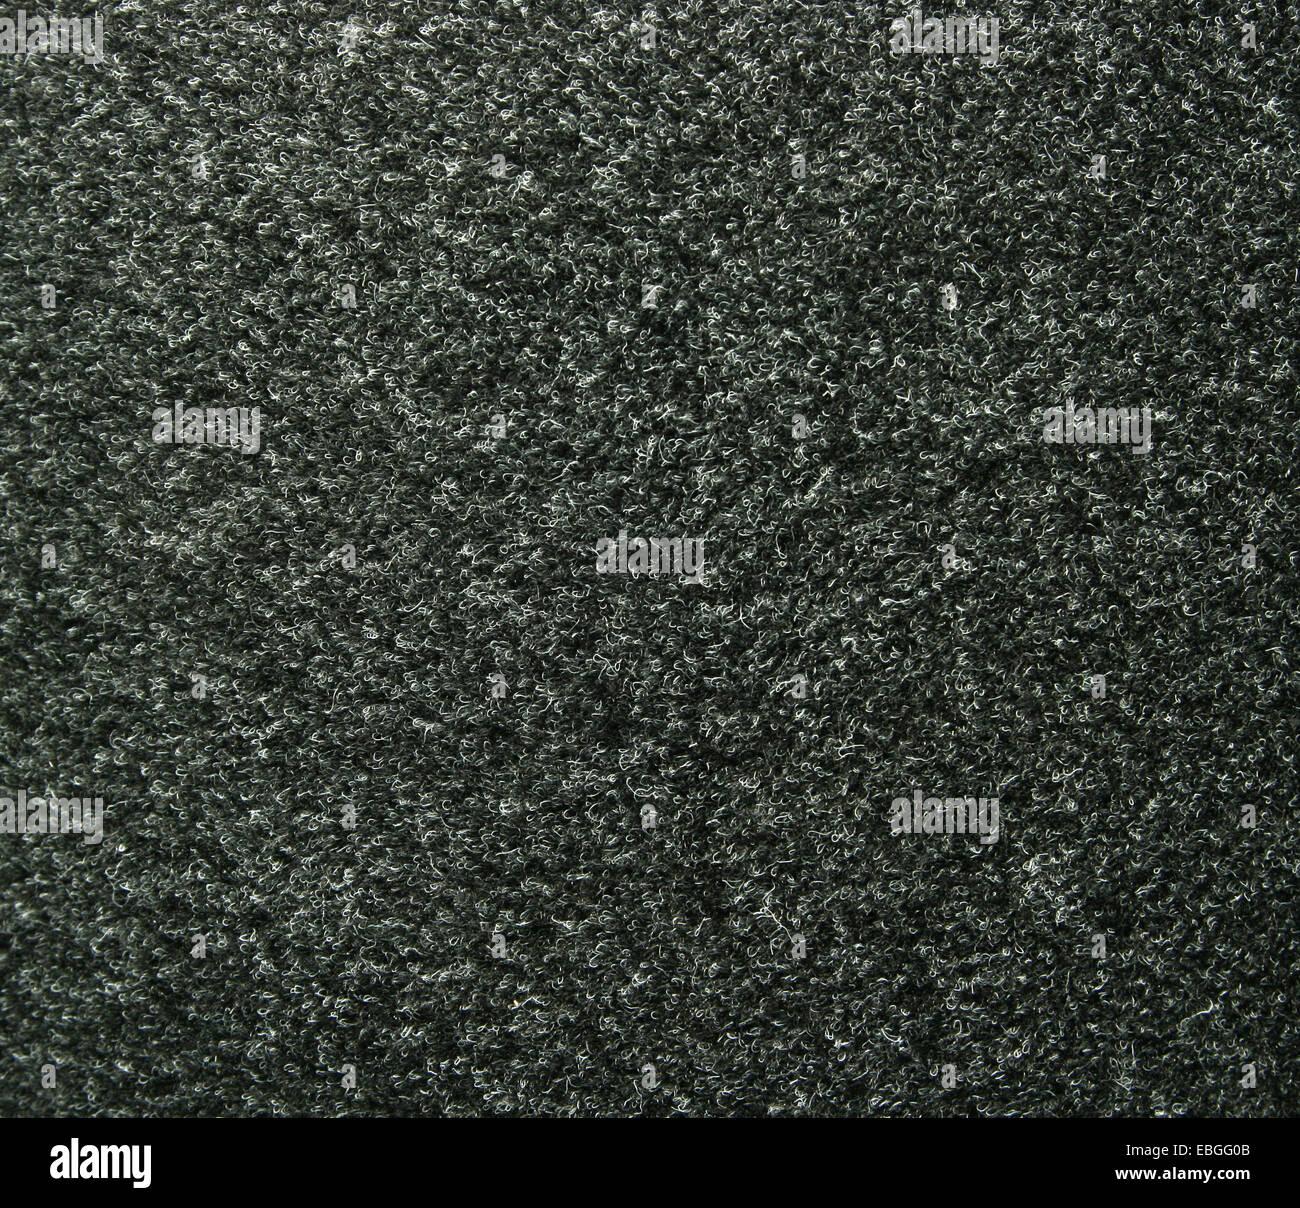 linoleum pattern stockfotos linoleum pattern bilder alamy. Black Bedroom Furniture Sets. Home Design Ideas